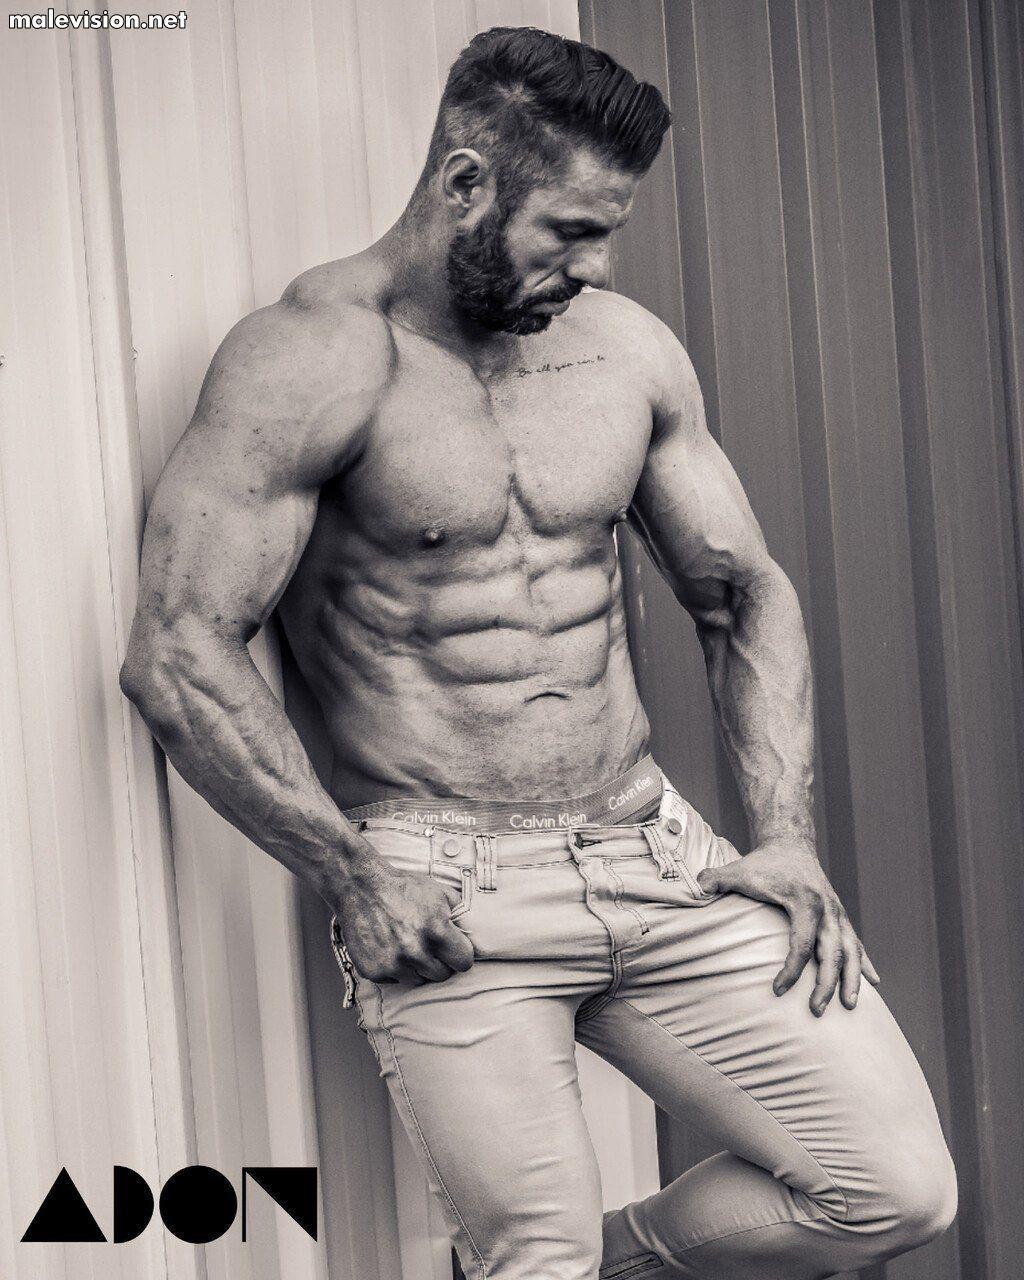 David Lurs 196 - Male Models - AdonisMale